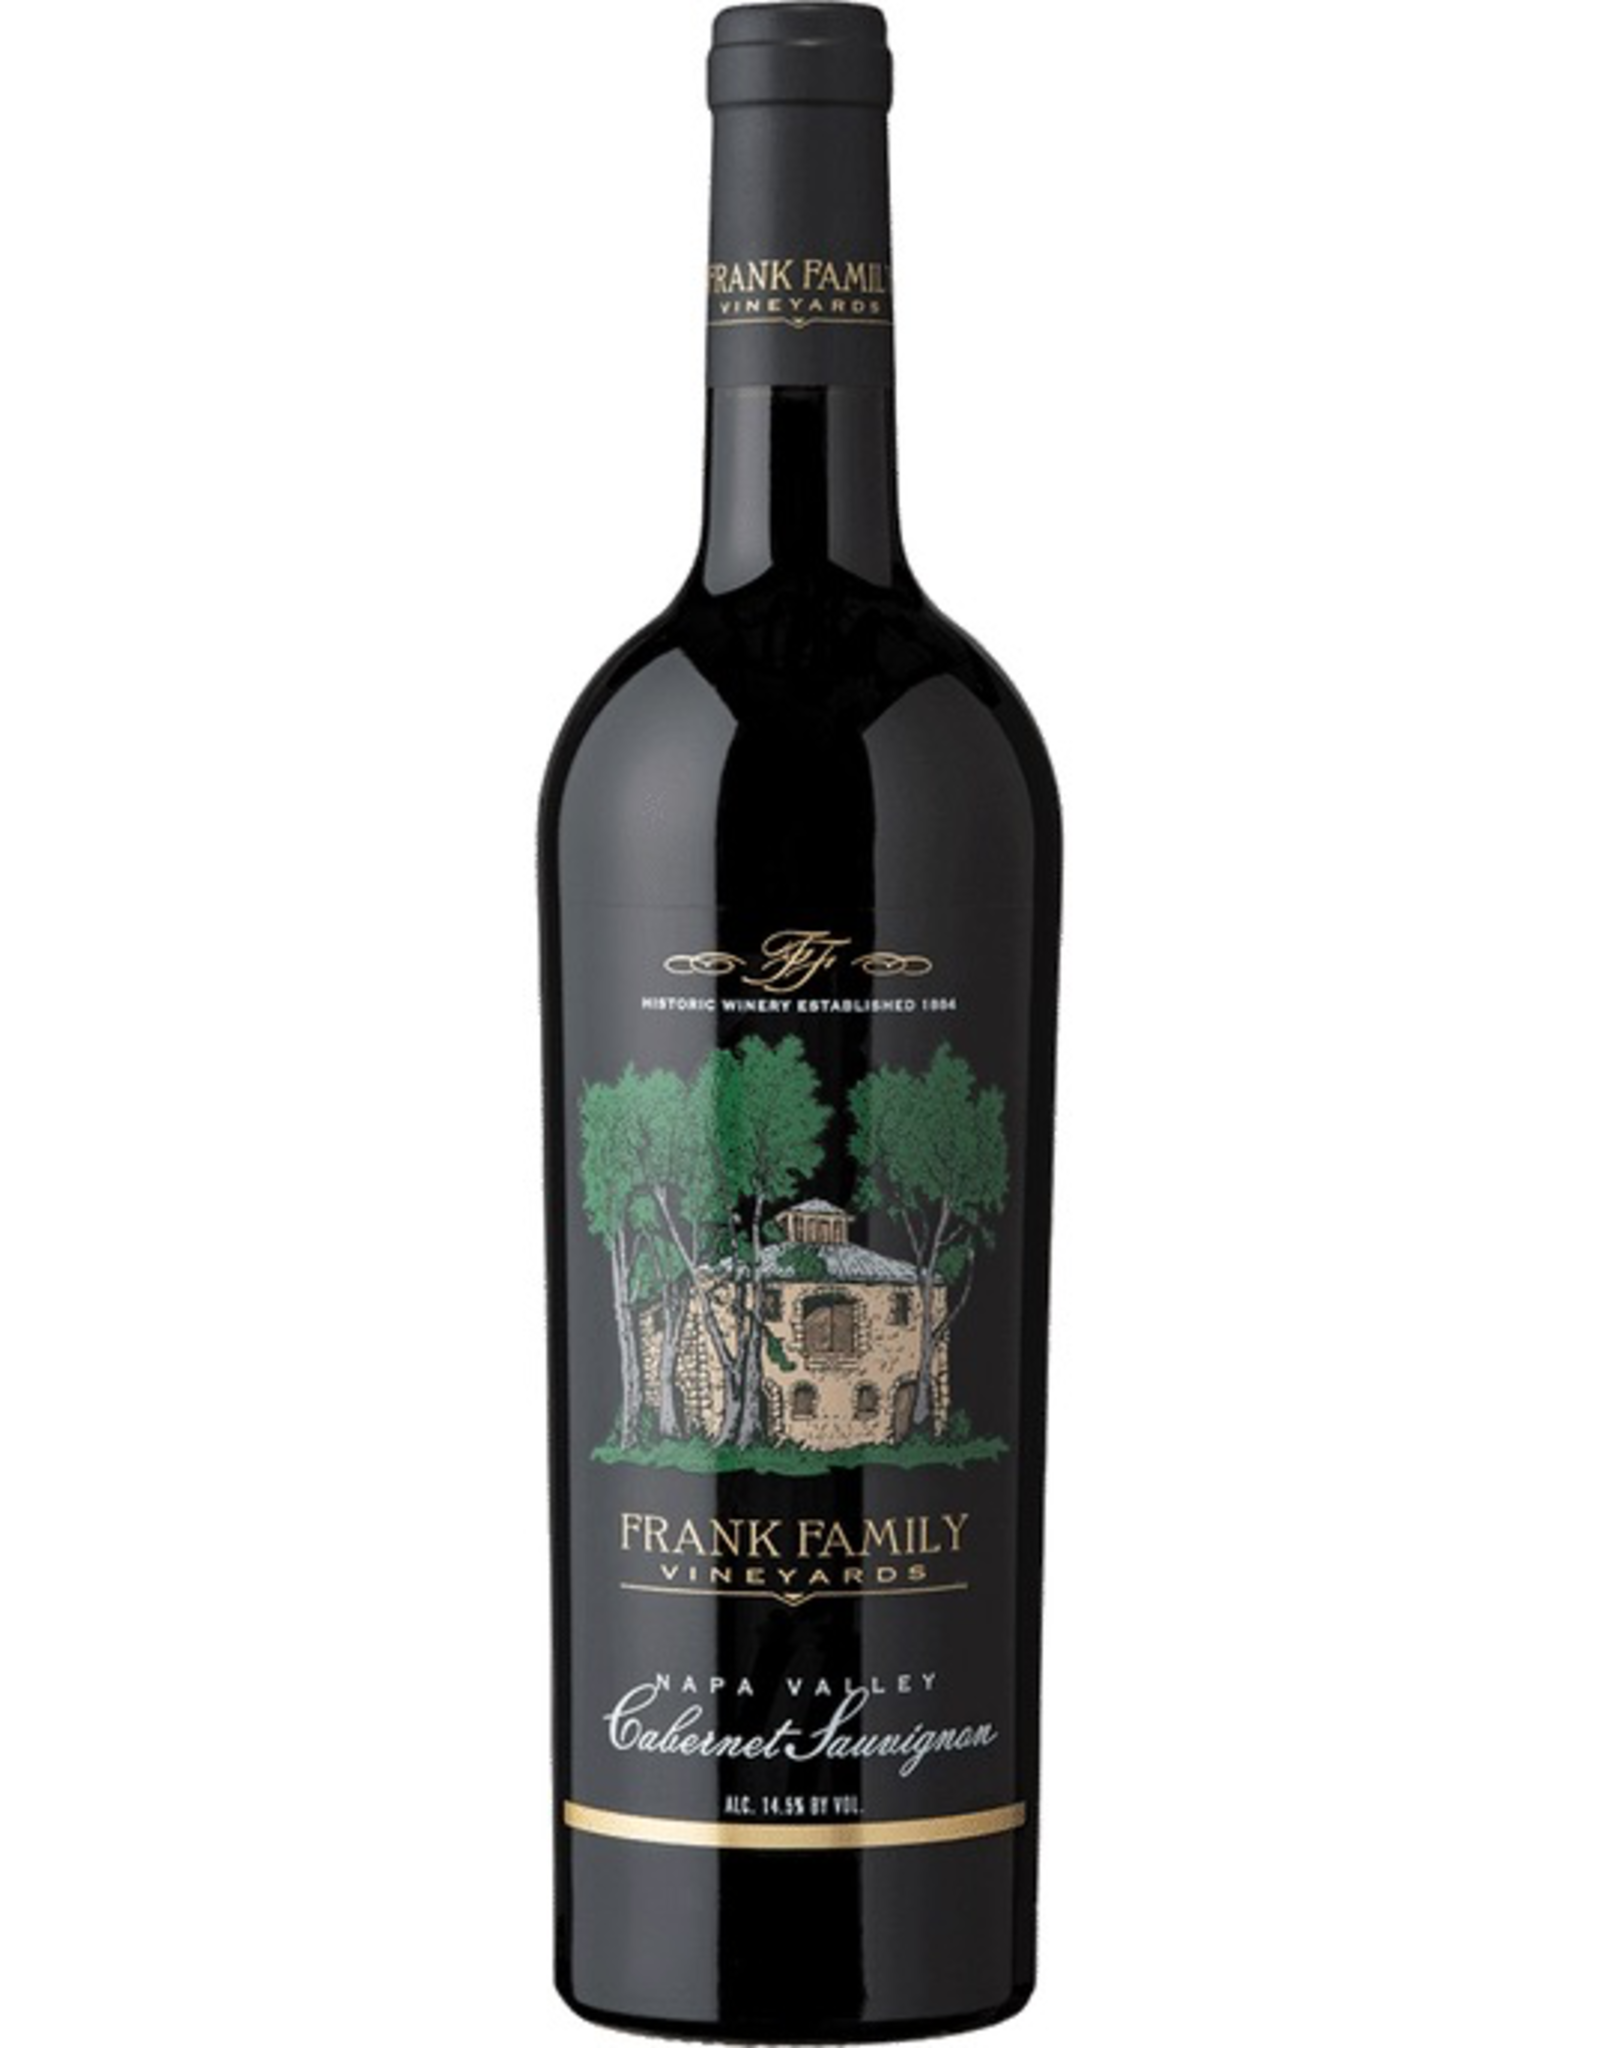 Red Wine 2016, Frank Family Vineyards, Cabernet Sauvignon, Multi AVA, Napa Valley, California, 14.5% Alc, CT na